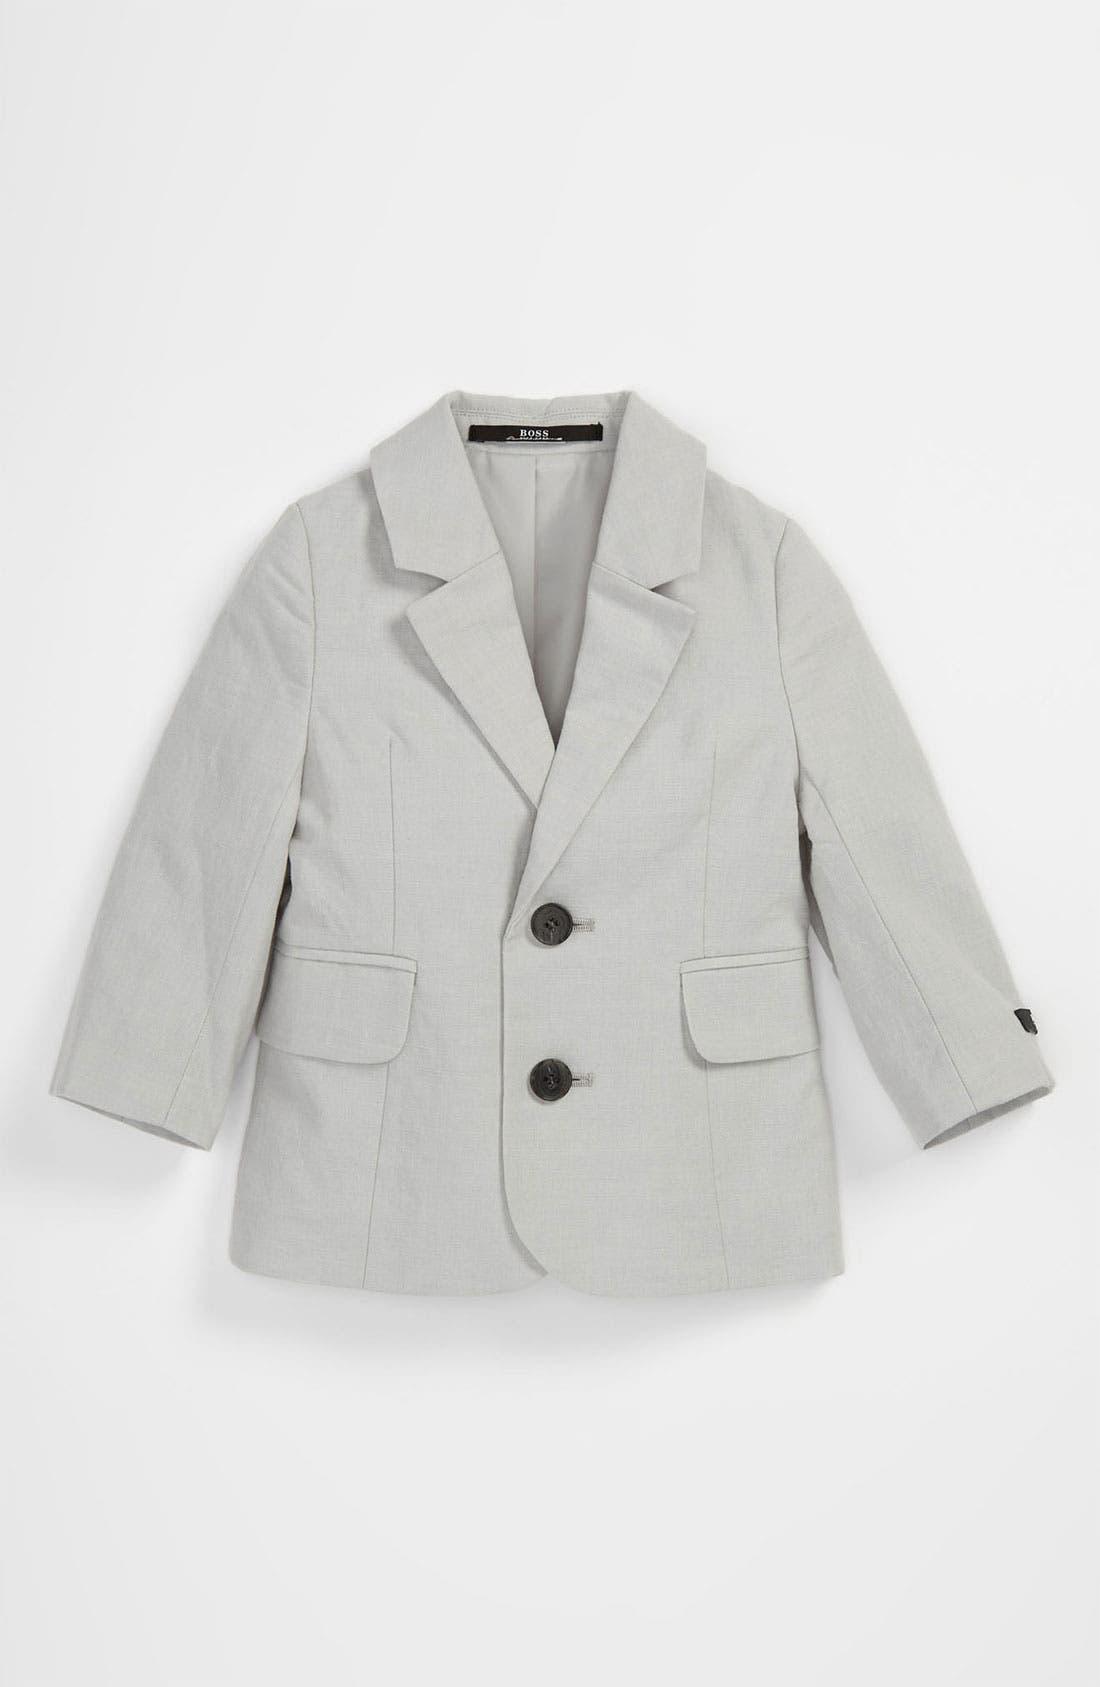 Main Image - BOSS Kidswear Two Button Linen Blend Jacket (Baby & Toddler)